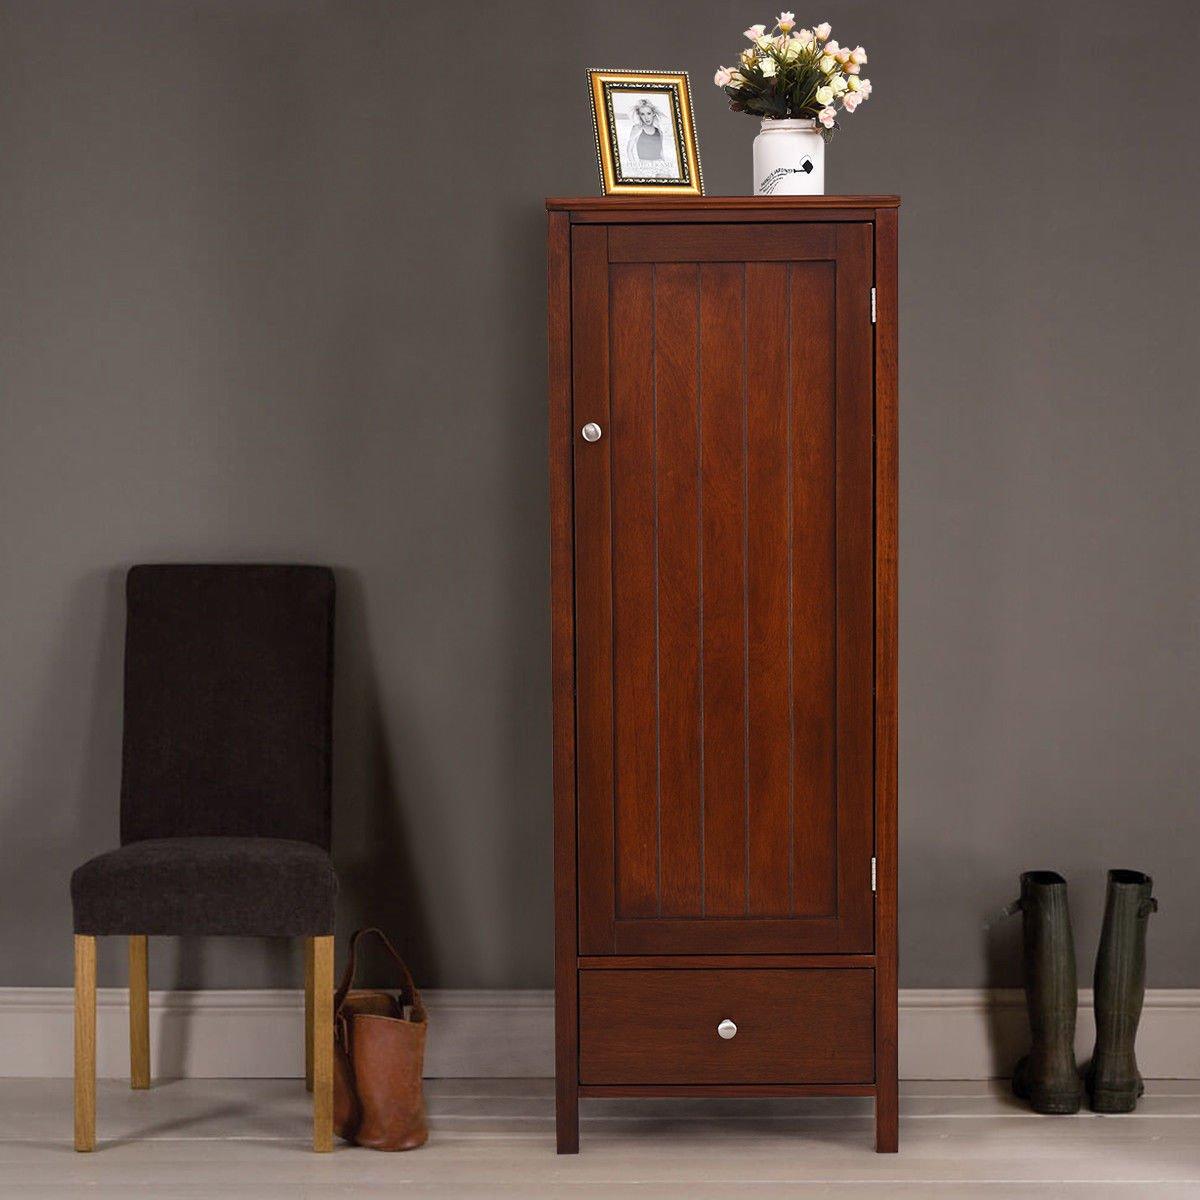 Amazon.com: Armarios Lapha de 1 puerta, 1 cajón, madera ...